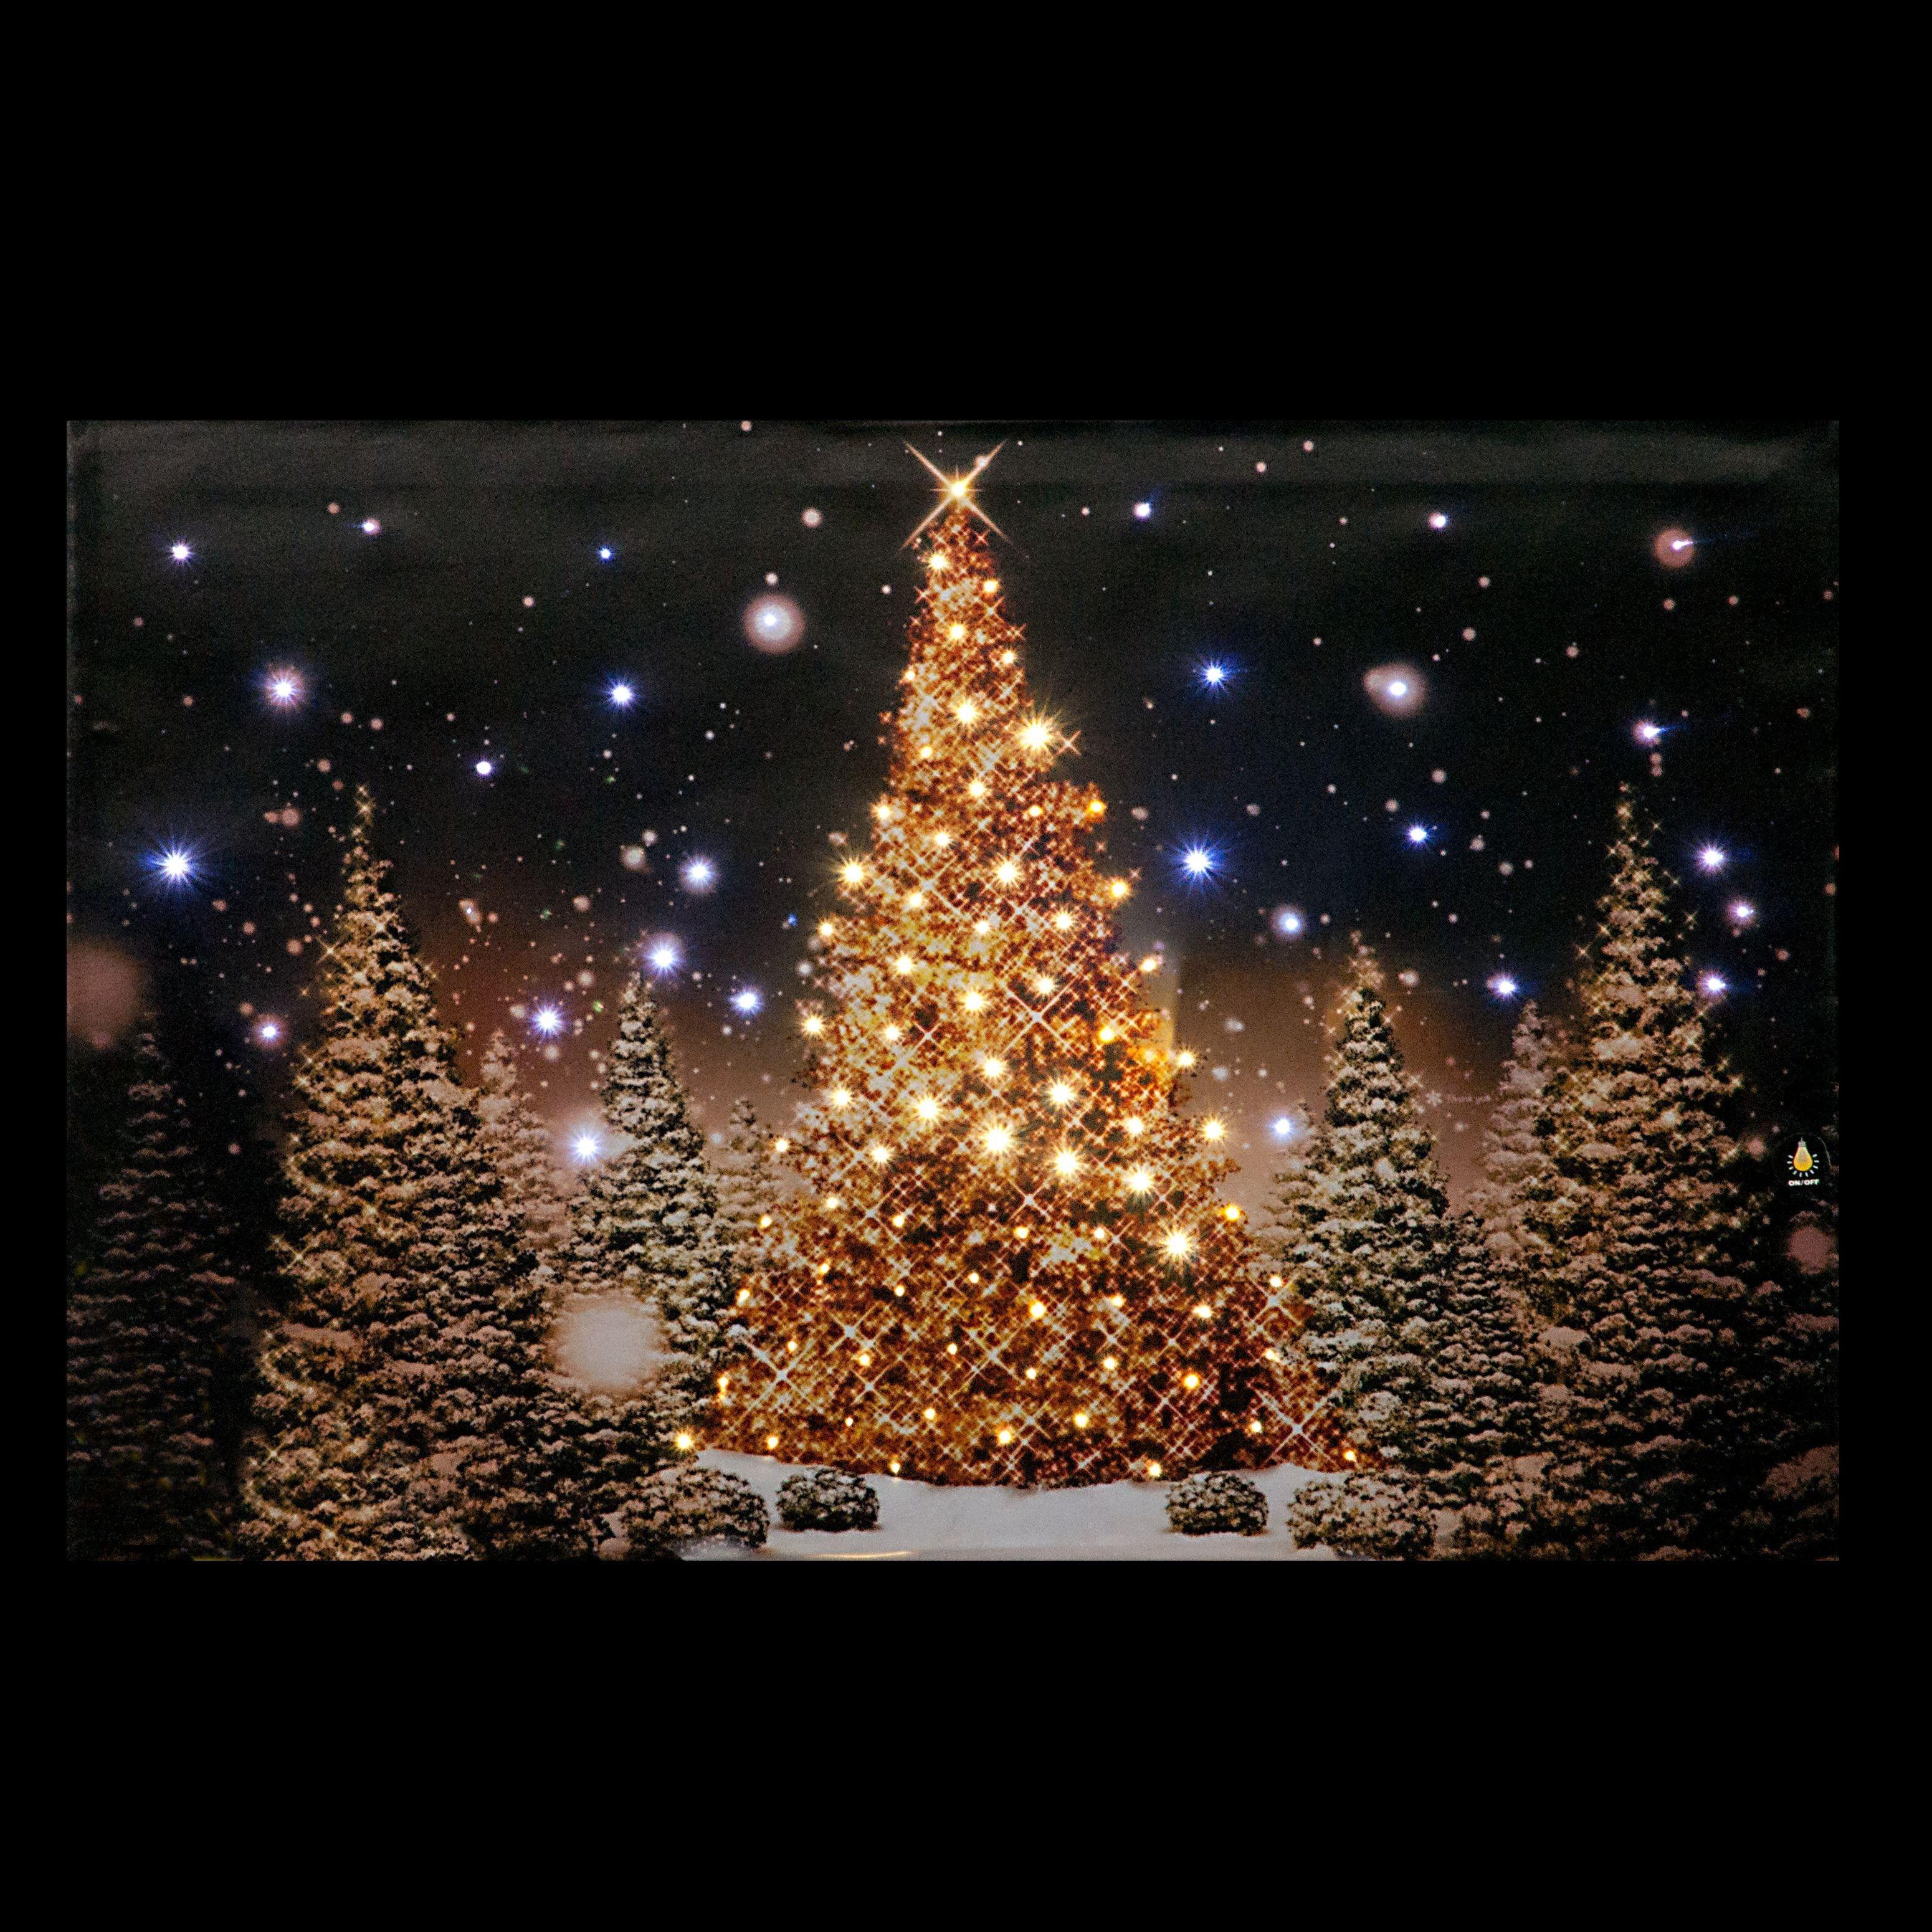 20 Wonderfull Awesome Christmas Decorations Gutter Following Site Ti Visit Temasistemi Lights